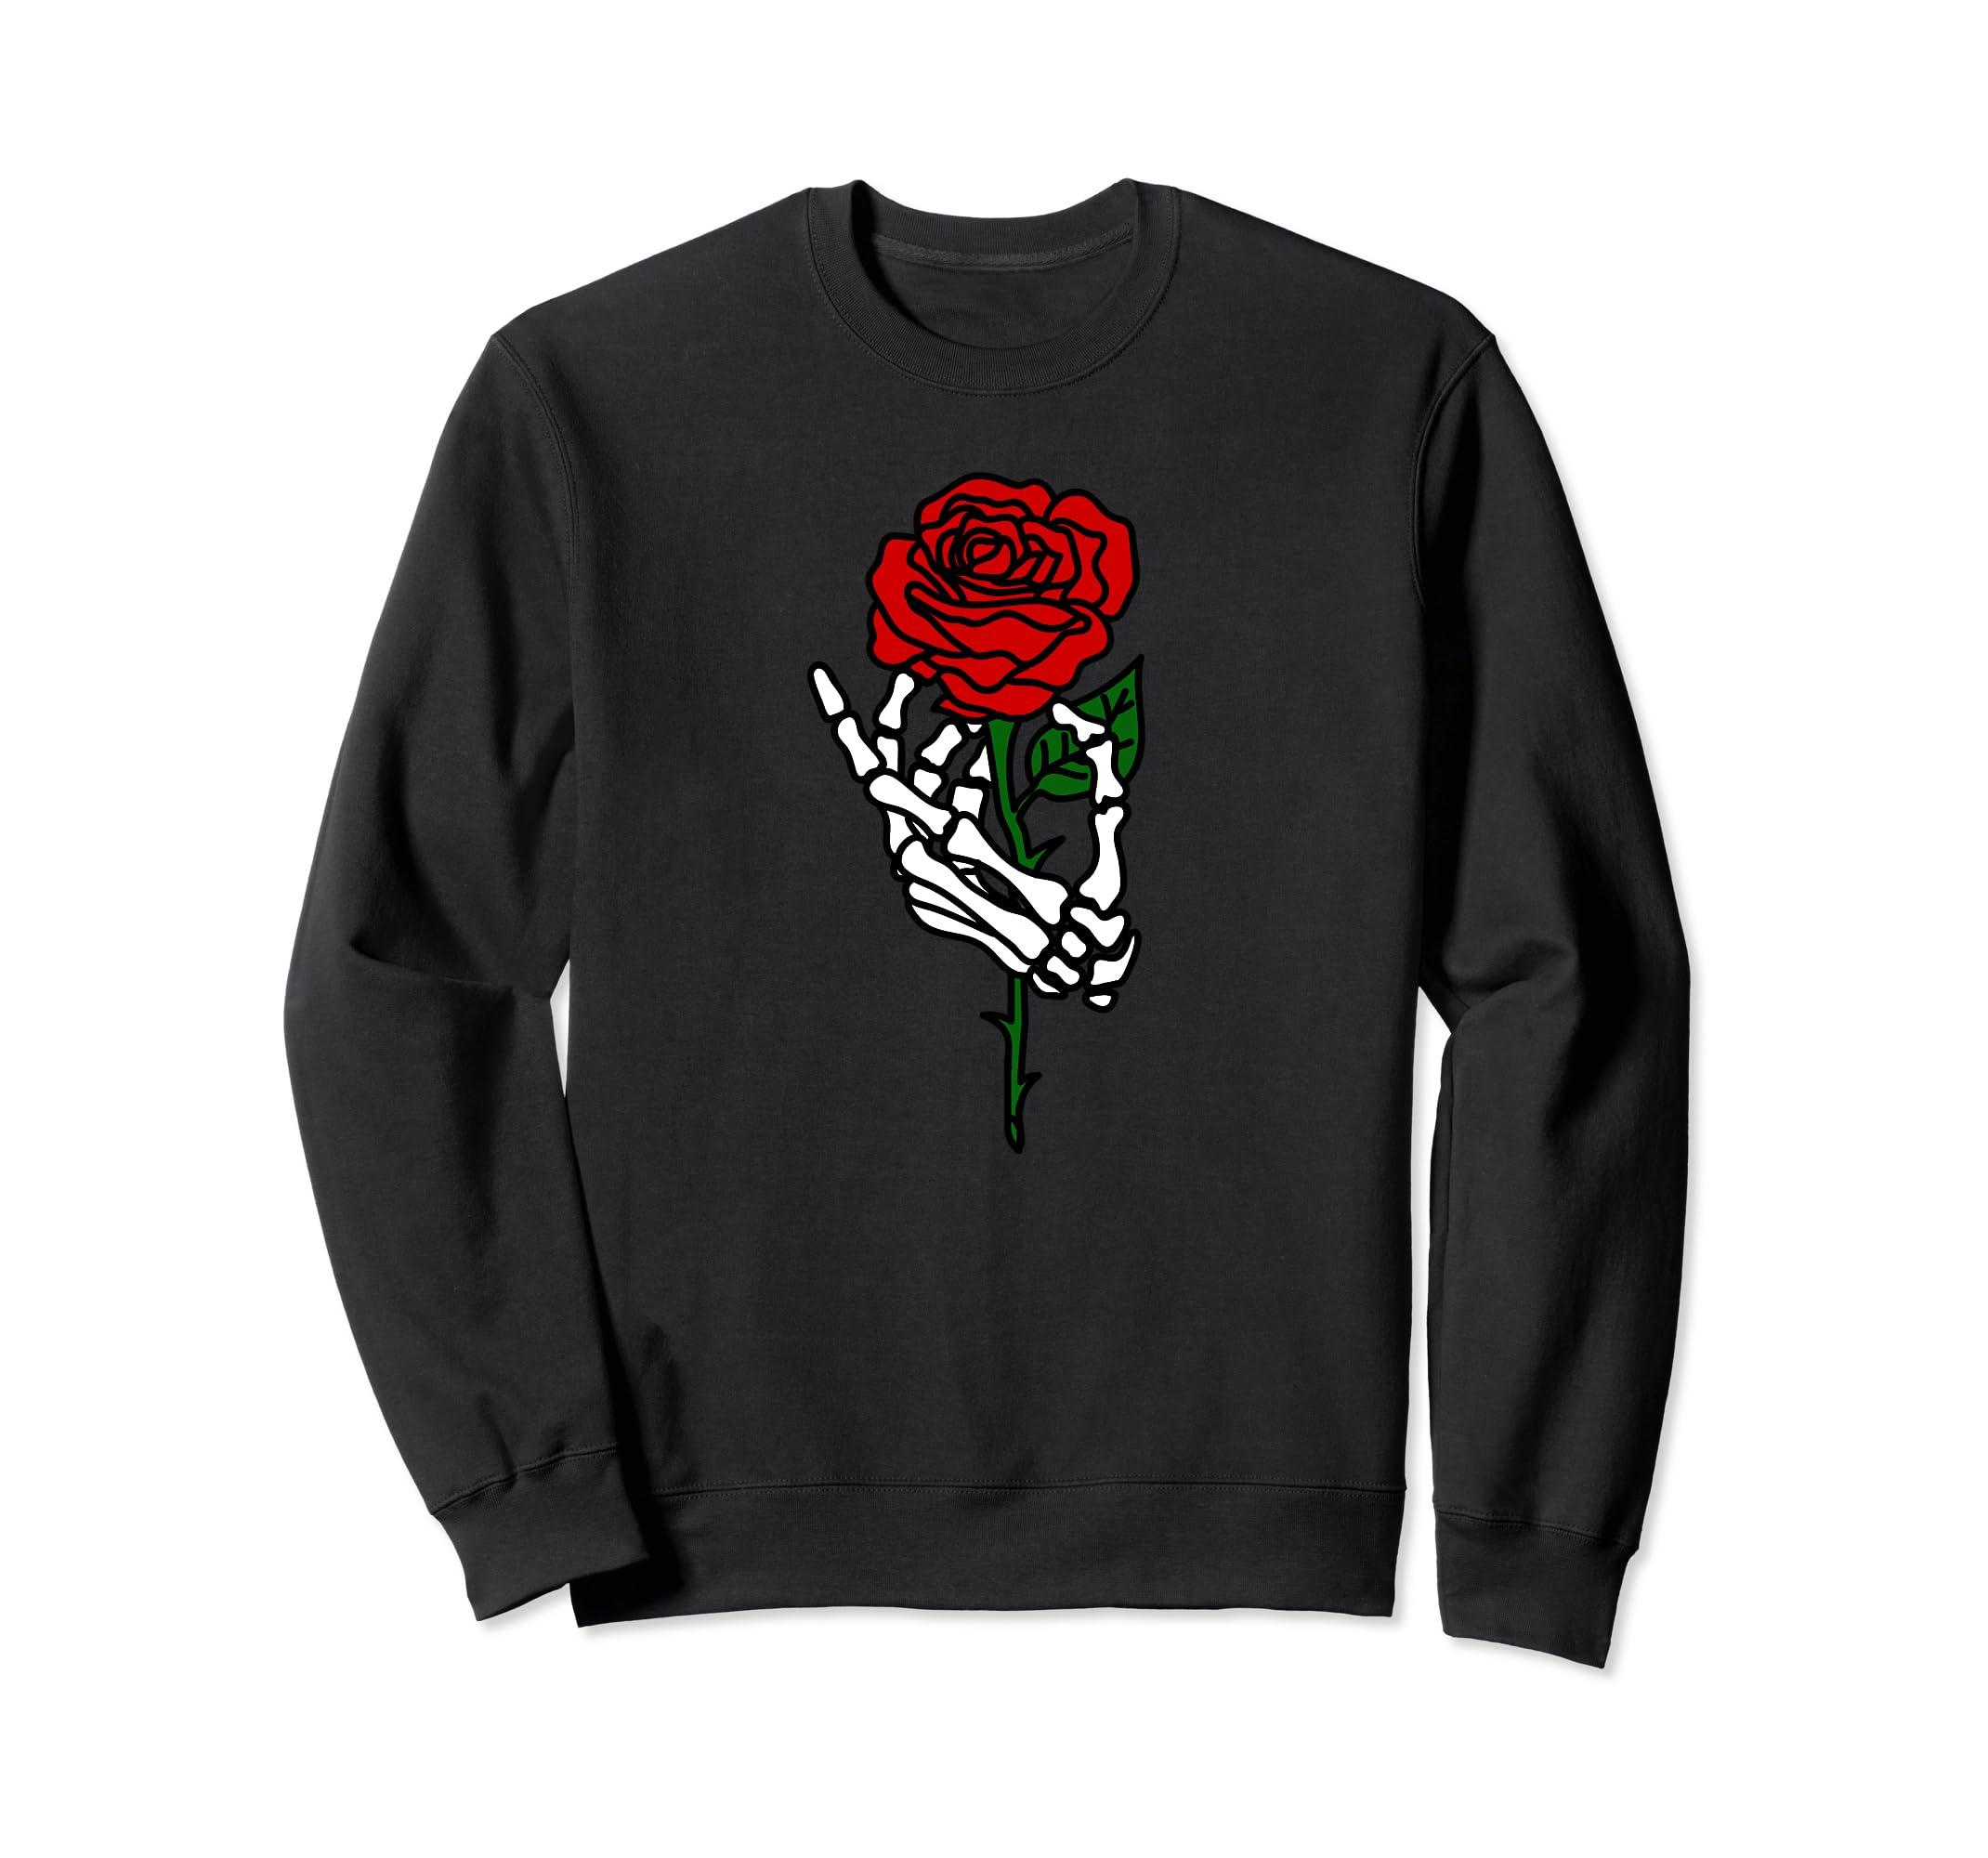 Skeleton Hand Holding Rose Sweatshirt, Tattoo Sweatshirts